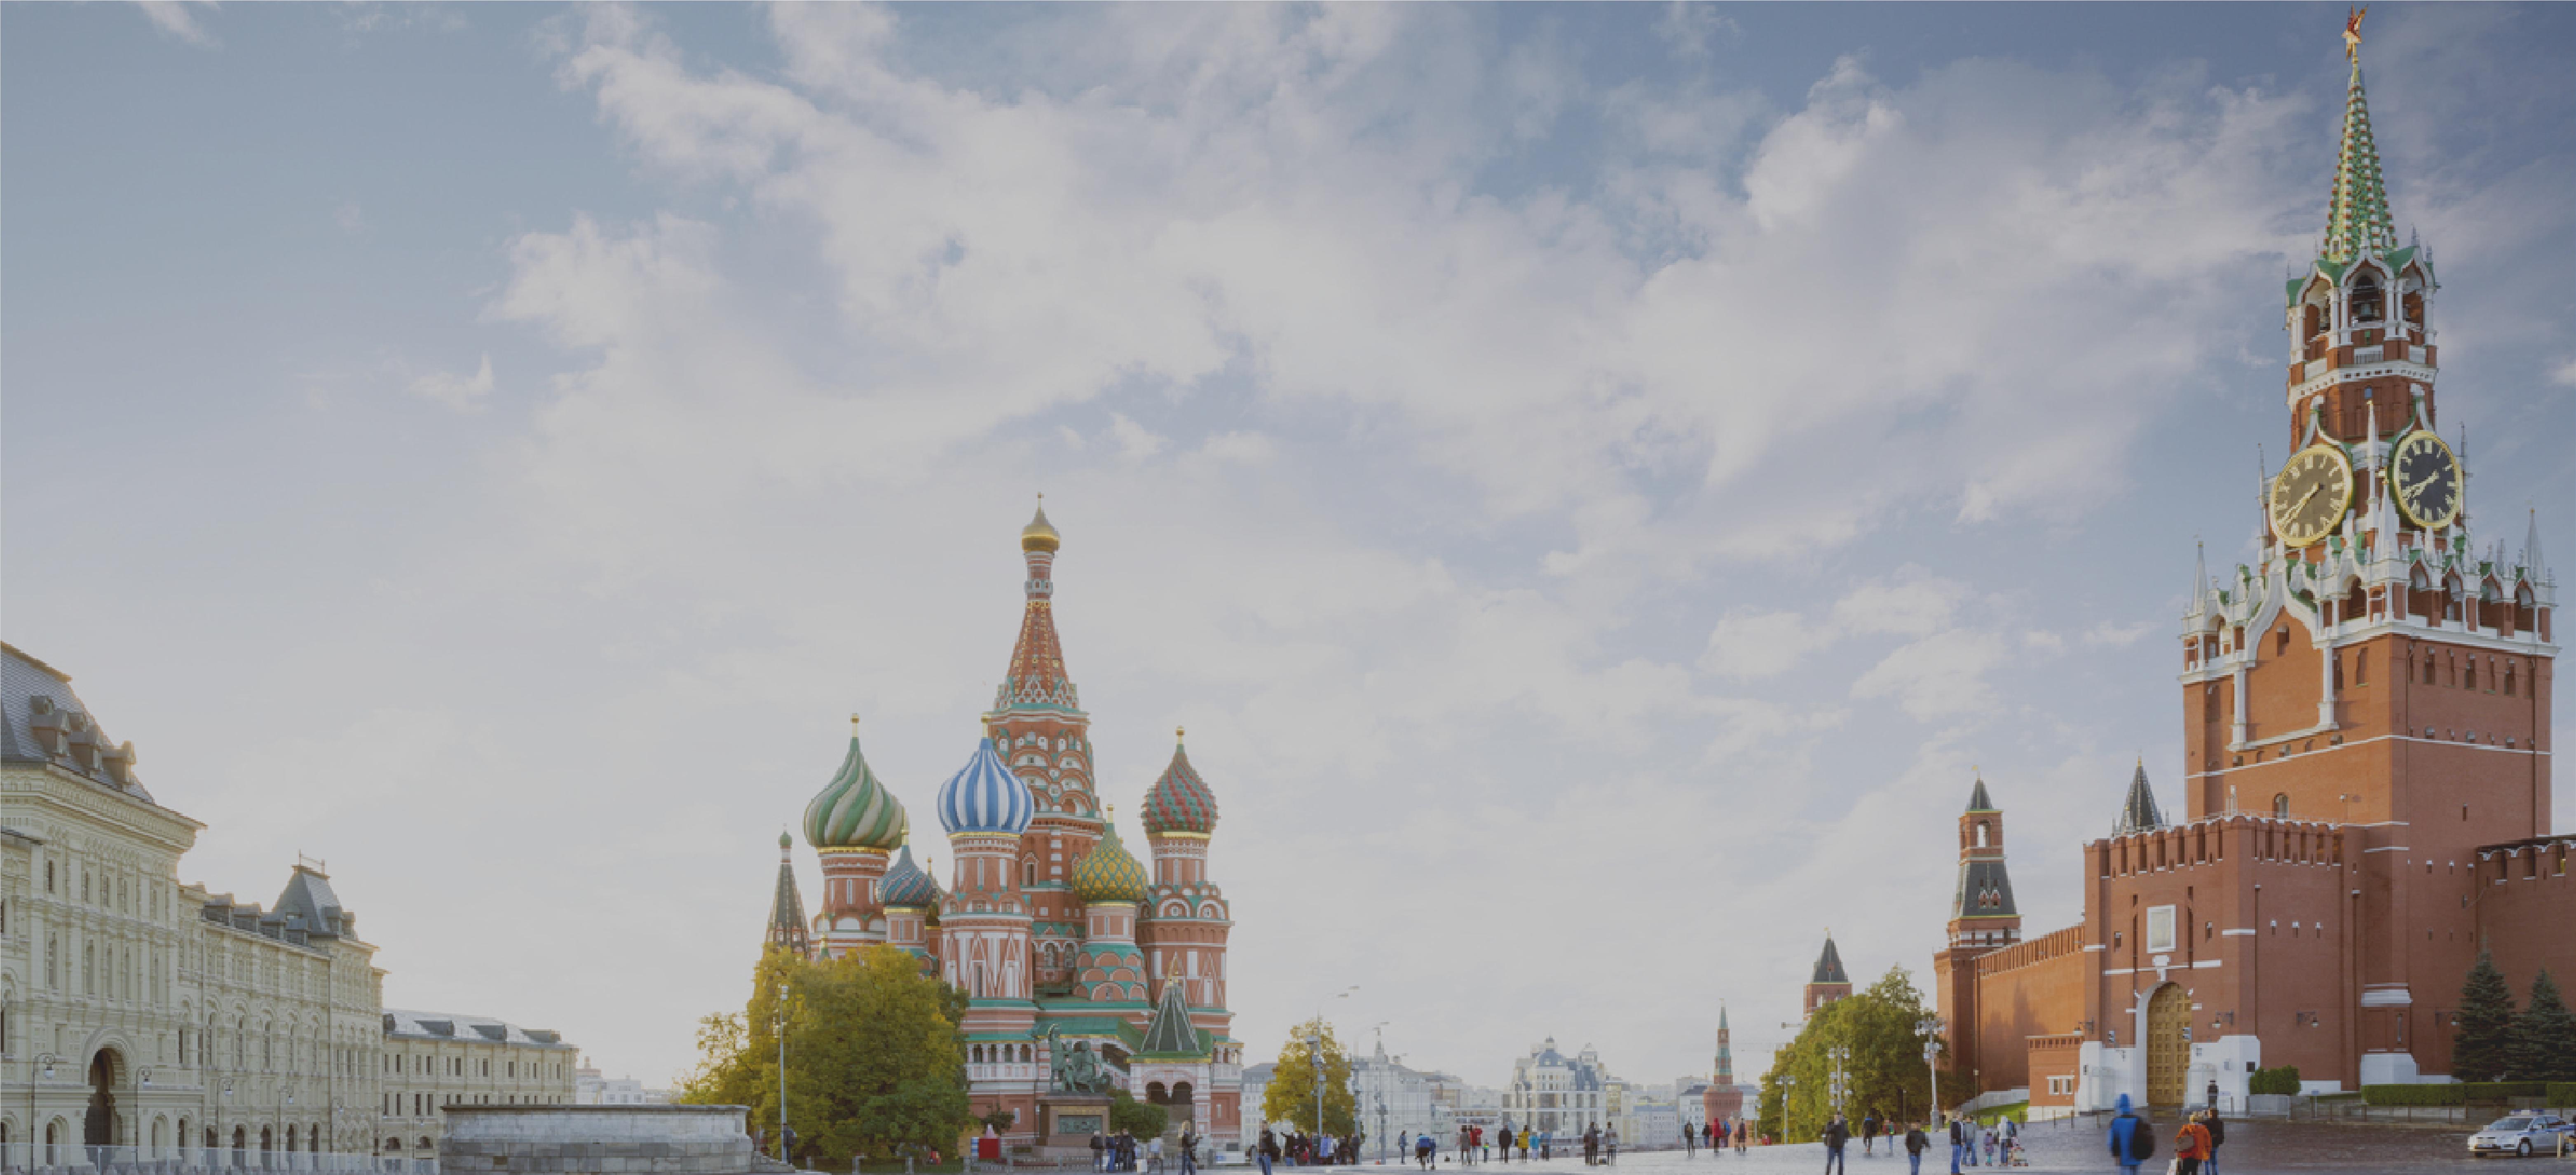 Moscú, San Petersburgo, Kazán, Kaliningrado y Sochi: 5 ciudades del mundial de Rusia que te van a enloquecer!